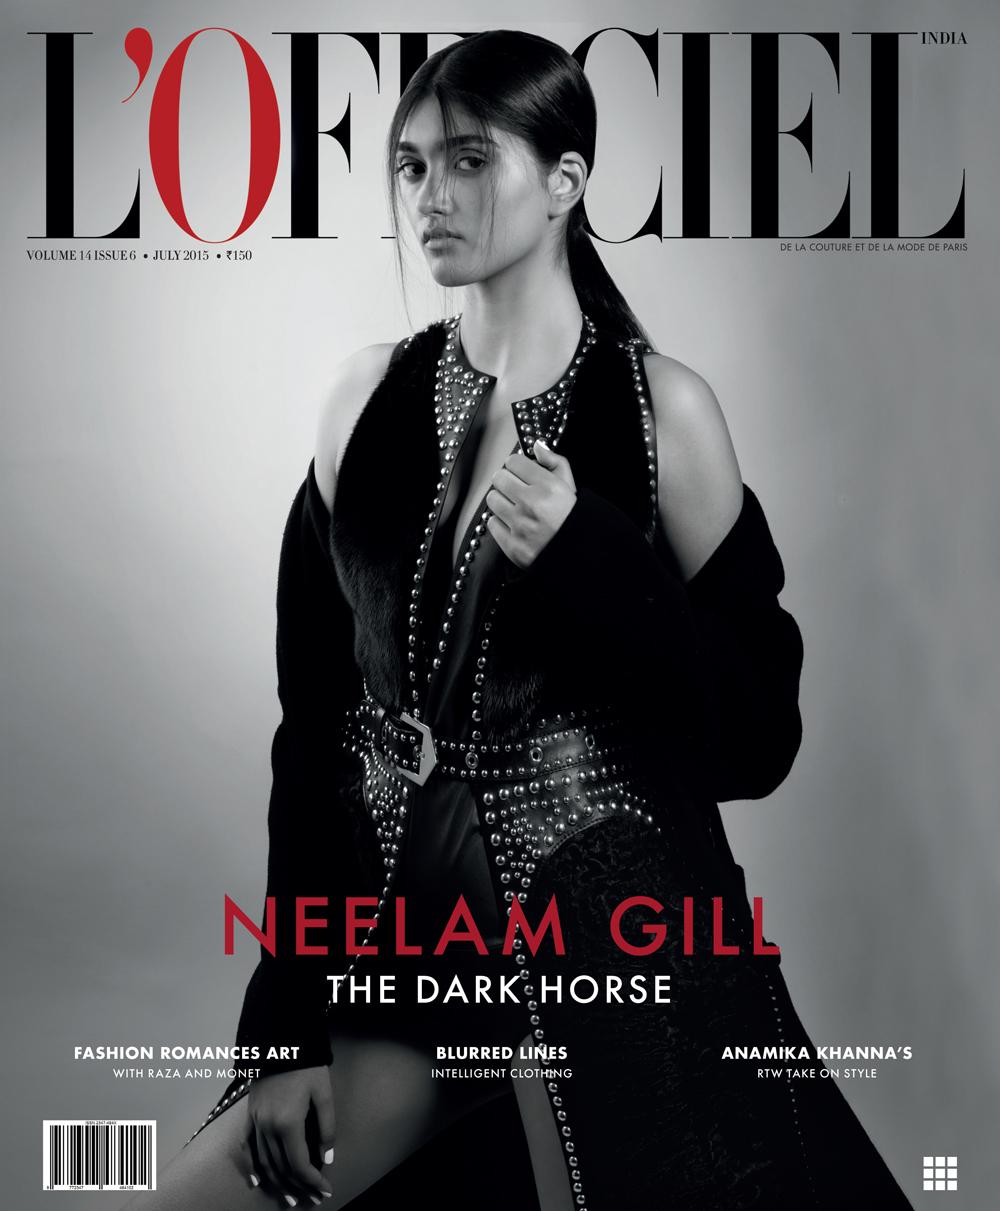 Neelam Gill by Onin Lorente for L'Officiel